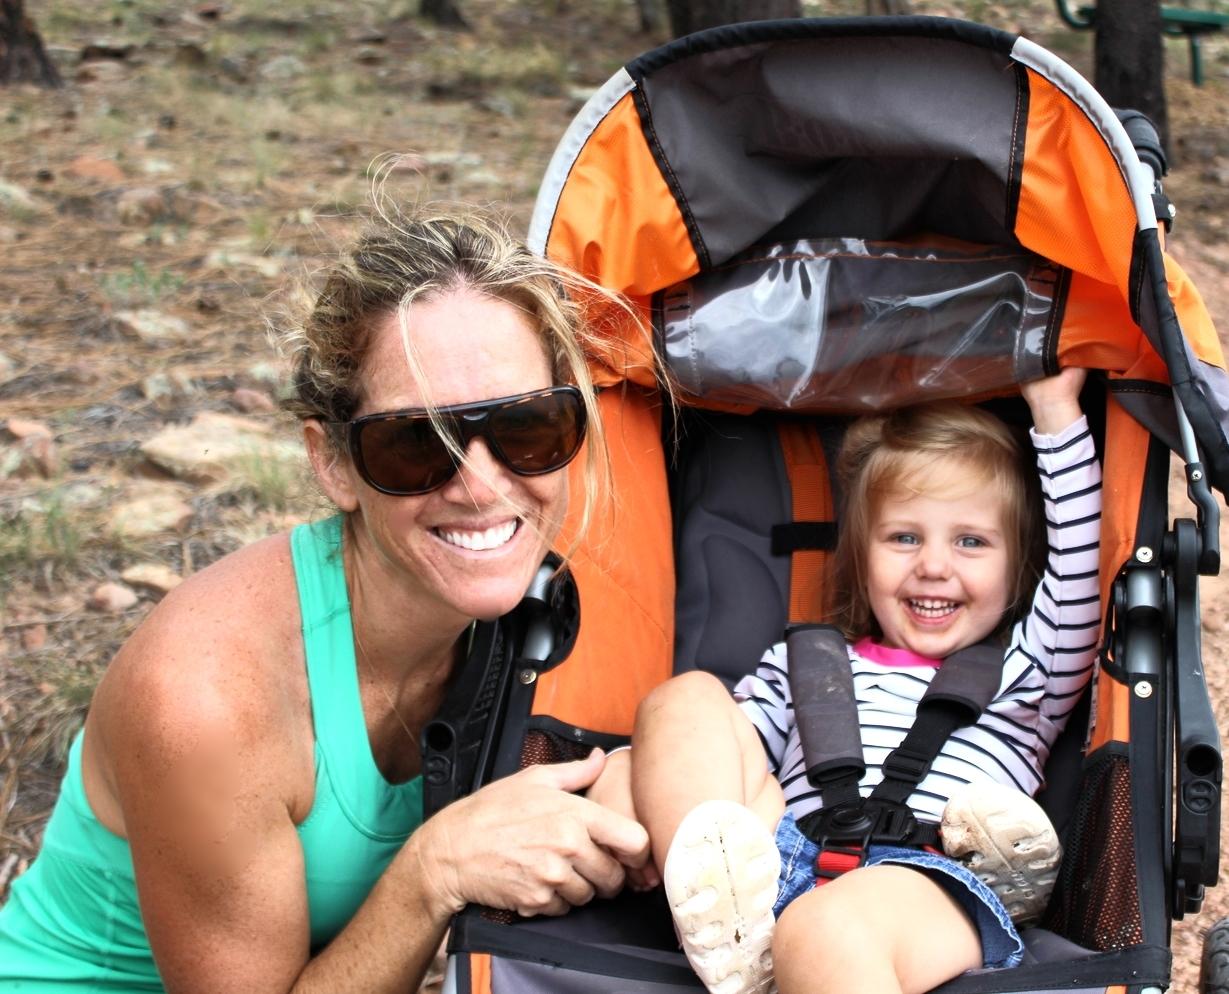 Our favorite running stroller, the B.O.B Sport Utility Stroller!http://www.bobgear.com/strollers/sport-utility-stroller